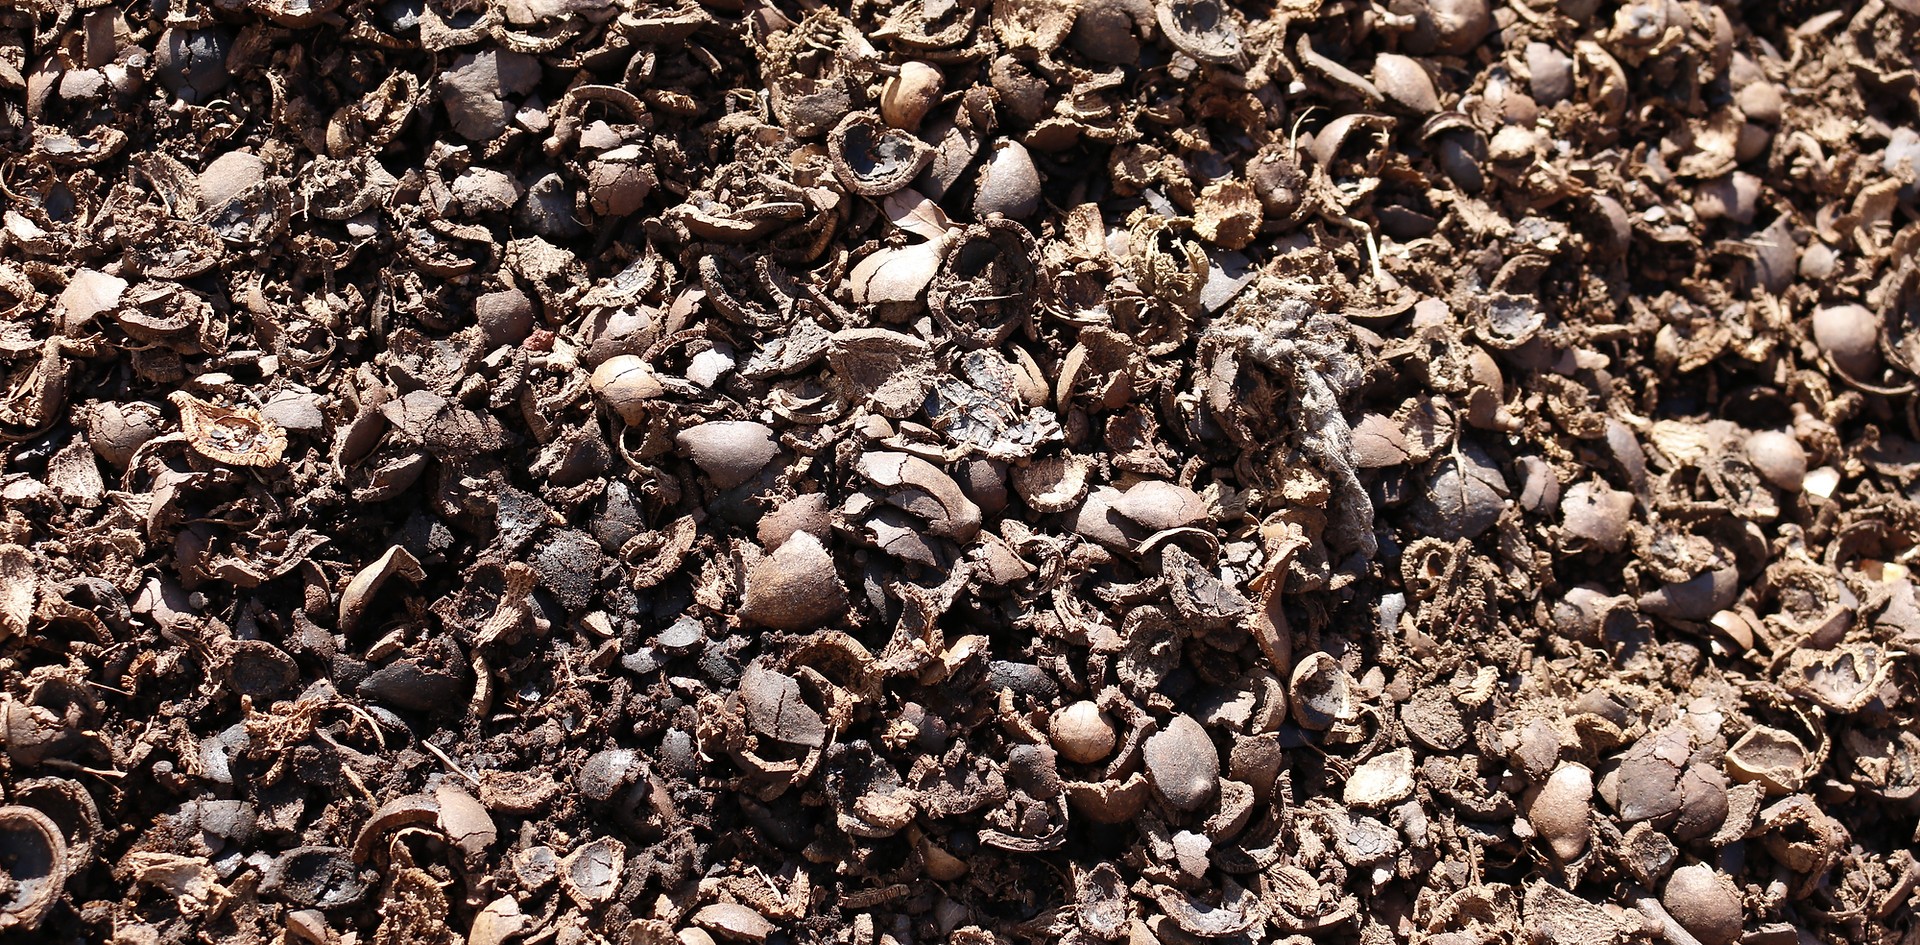 Whole Macadamia Nut Husks